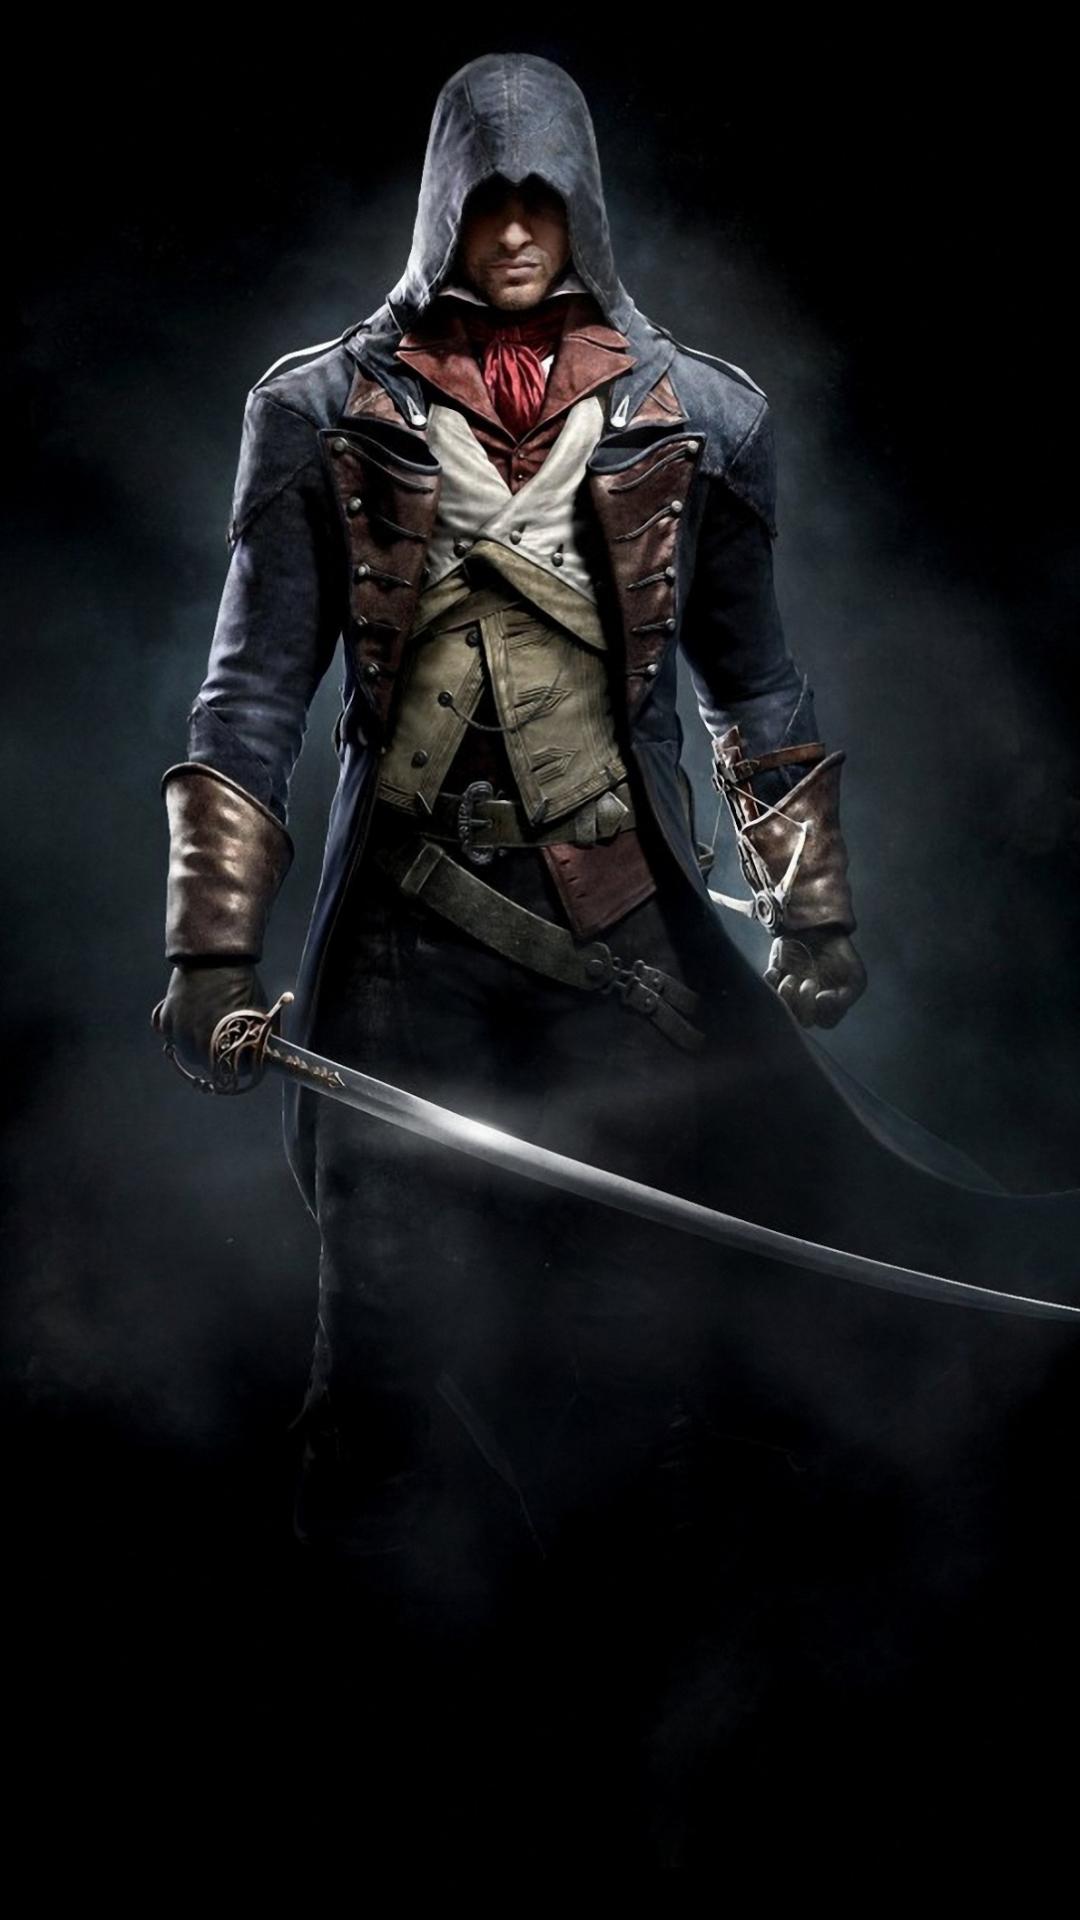 Assassins Creed Wallpaper Hd 1080p Hd Assassin S Creed Wallpaper For Iphone Pixelstalk Net